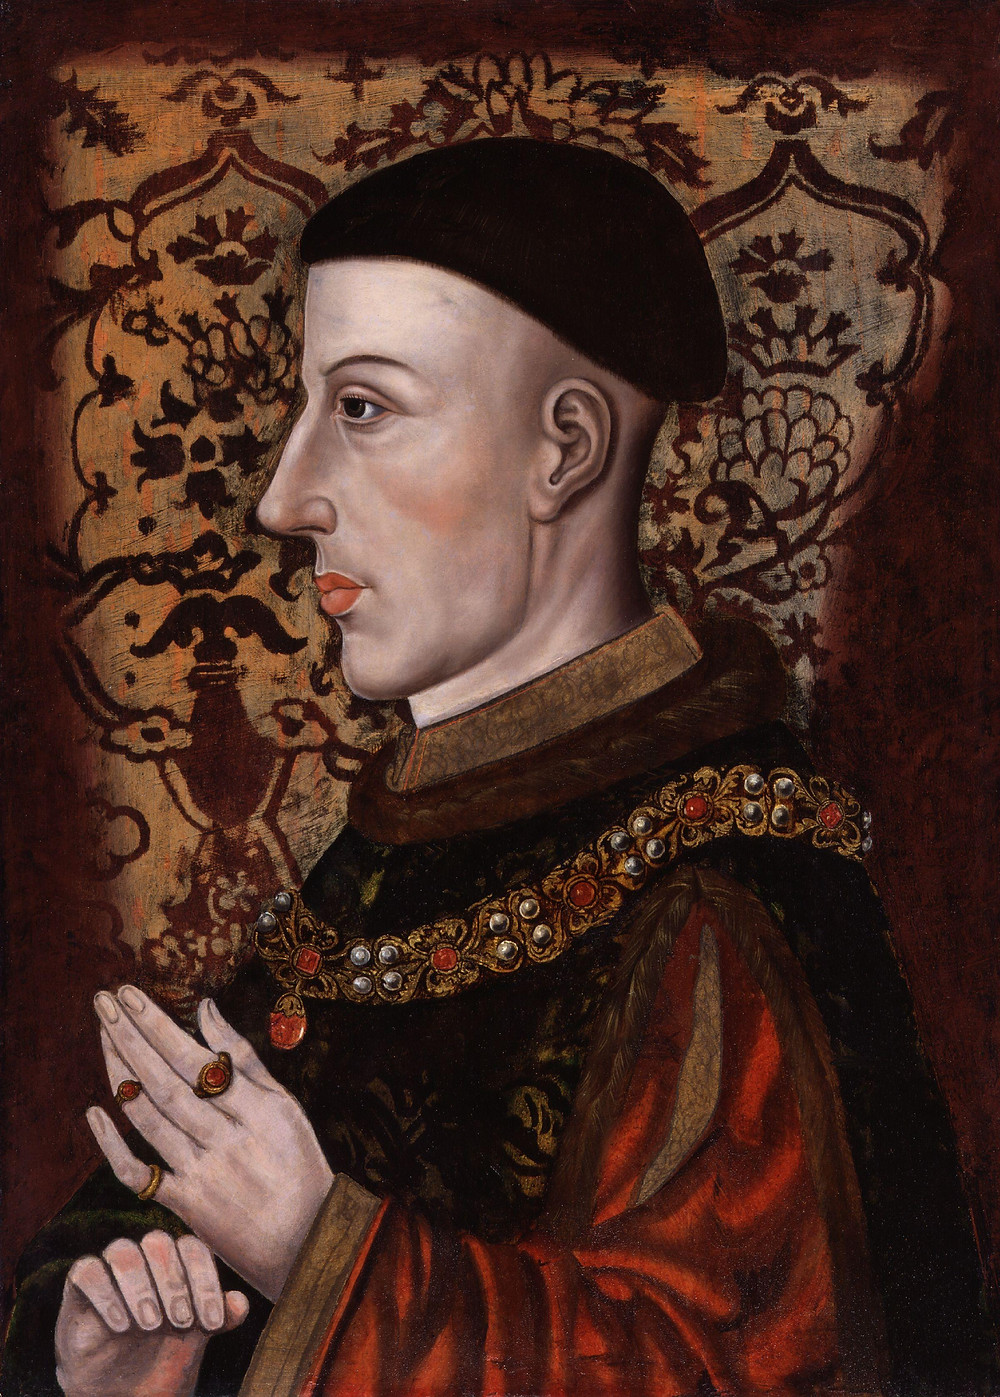 Henry V National Portrait Gallery [Public domain or Public domain], via Wikimedia Commons